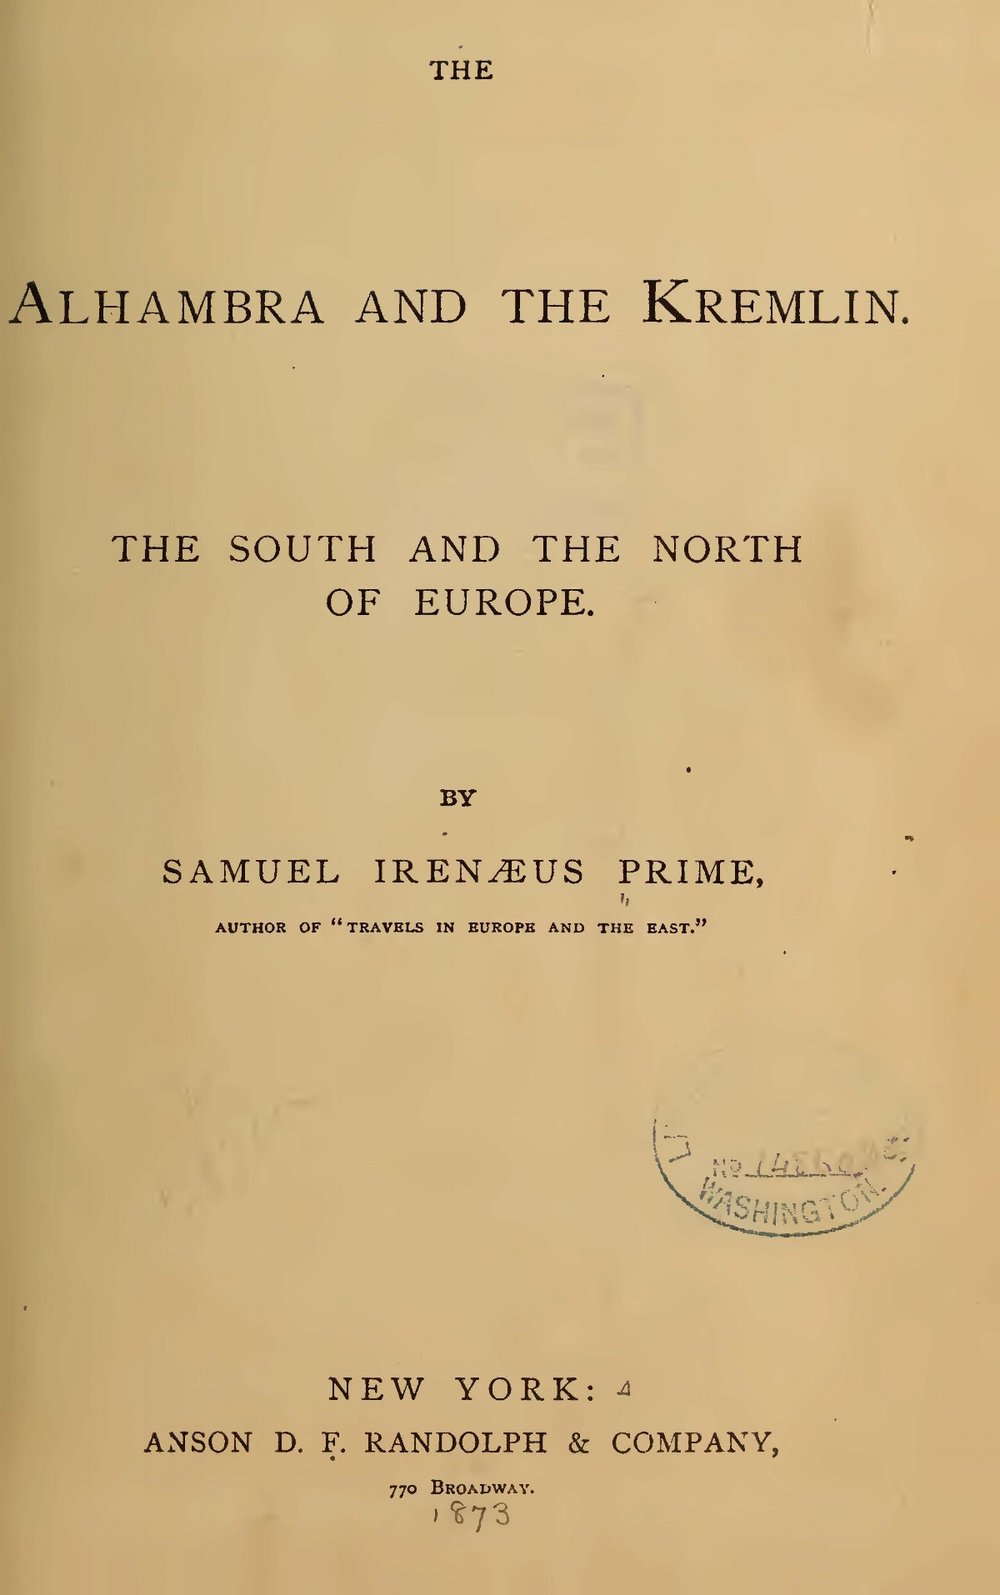 Prime, Samuel Irenaeus, The Alhambra and the Kremlin Title Page.jpg